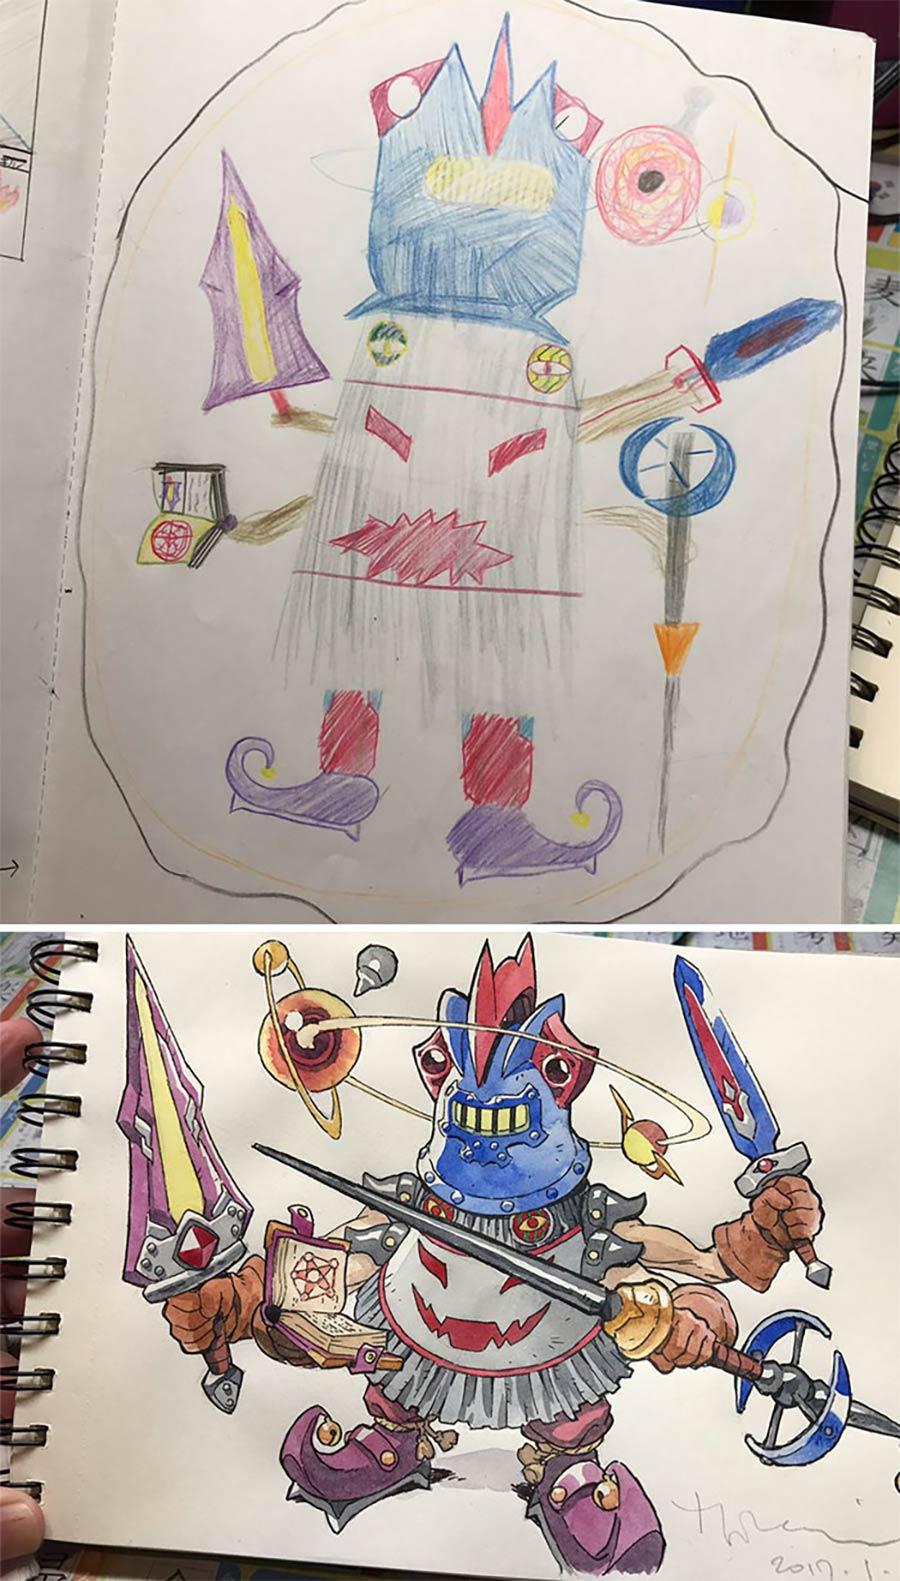 Vater macht aus den Kritzeleien seines Sohnes Anime-Kunst thomas-romain_03